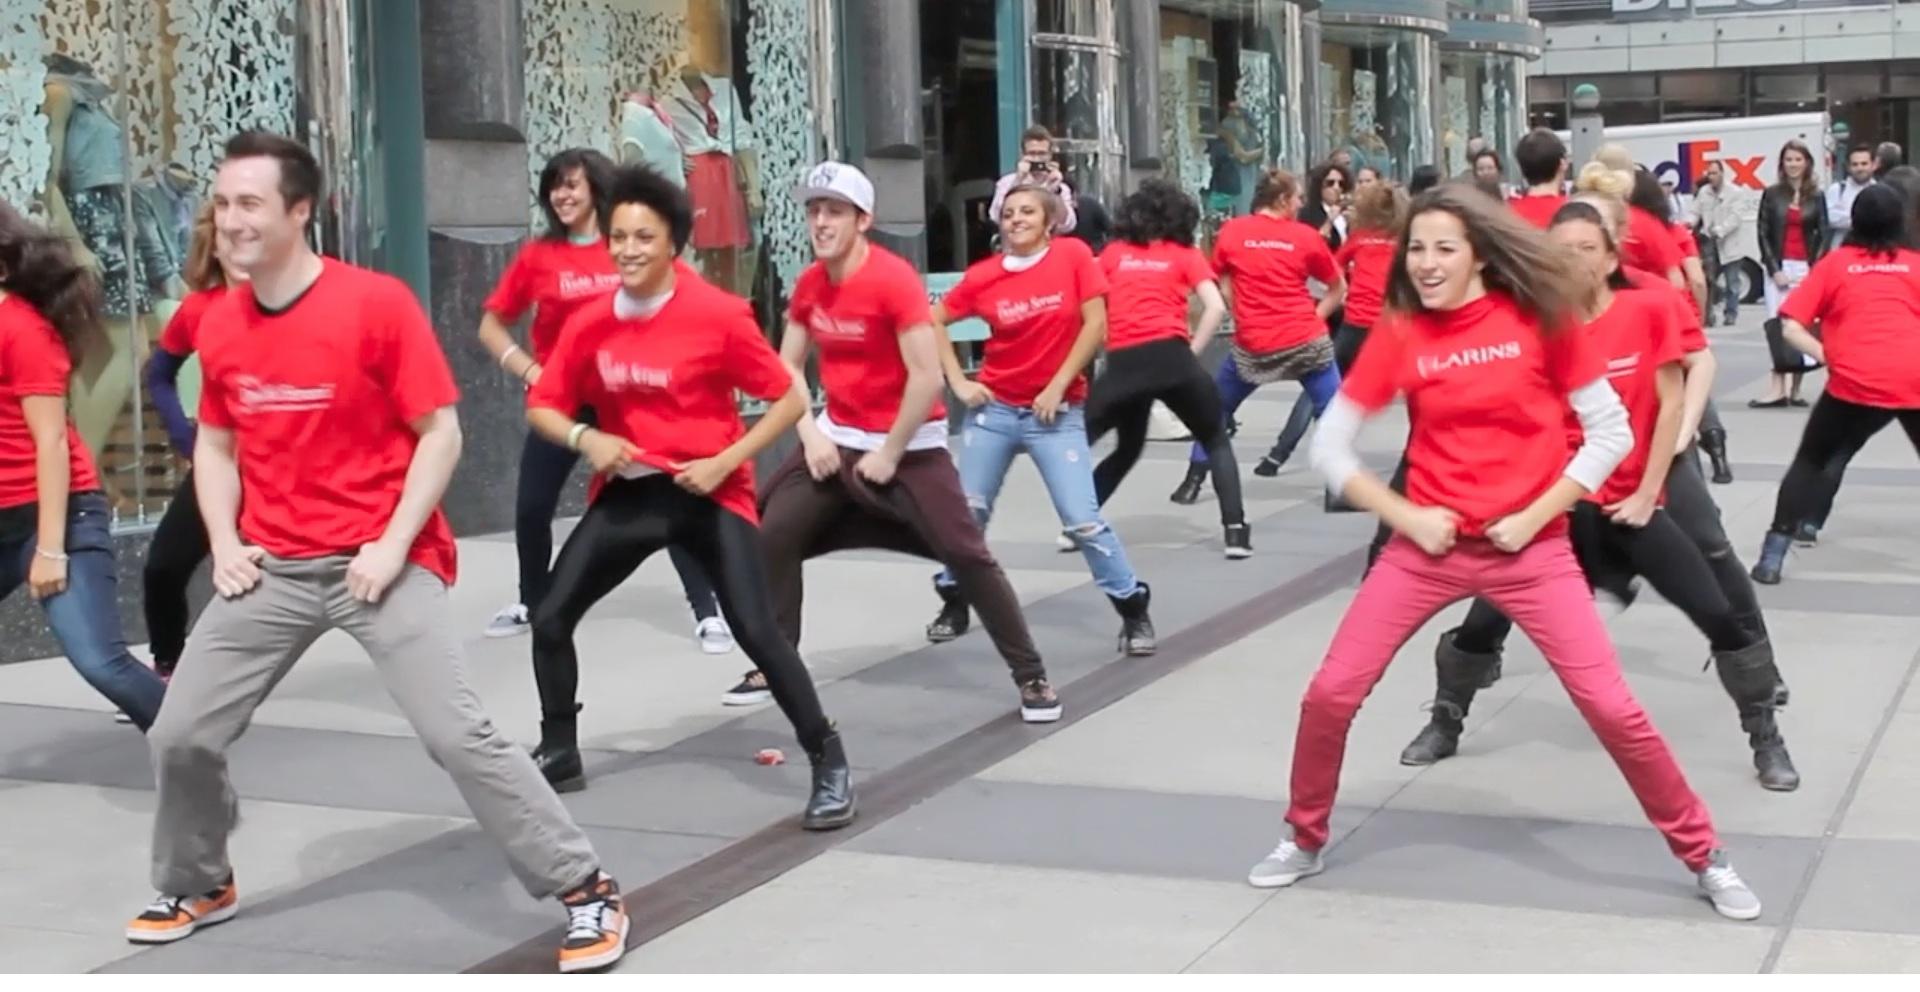 Marketing Flash Mobs | Big Hit Flash Mobs: bighitflashmobs.com/promotional-flash-mob